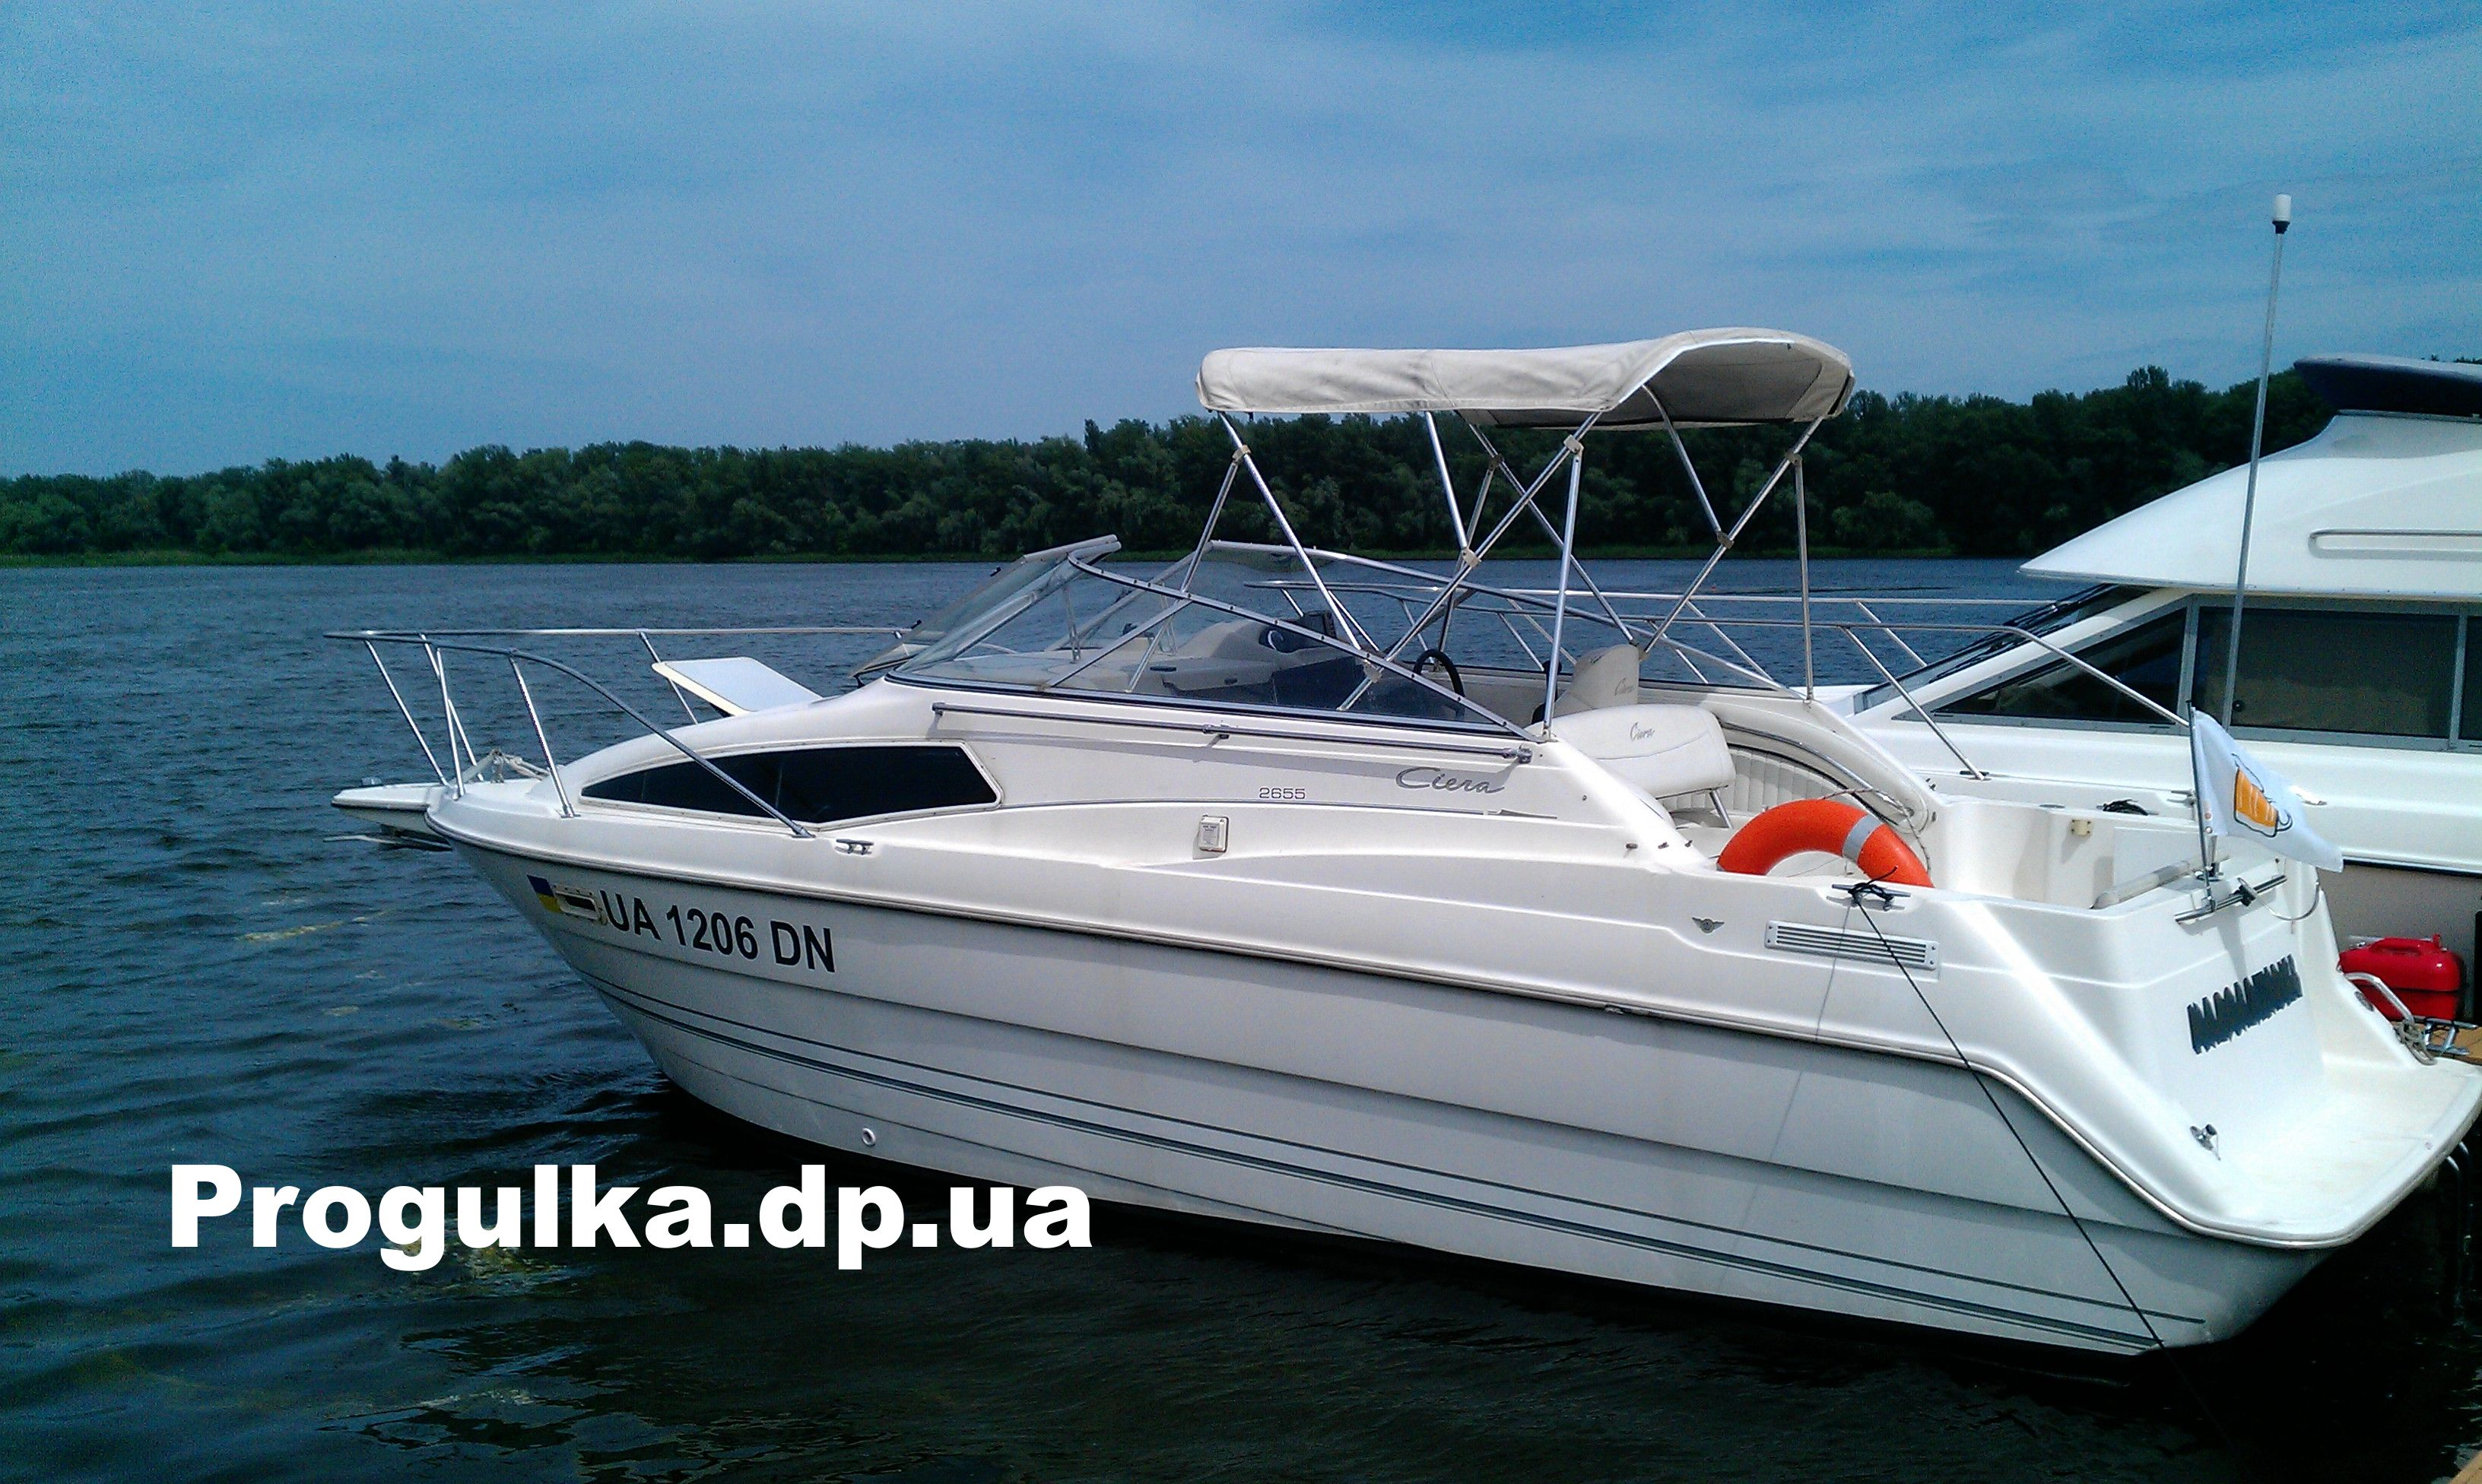 прогулки на моторных яхтах в днепропетровске cf